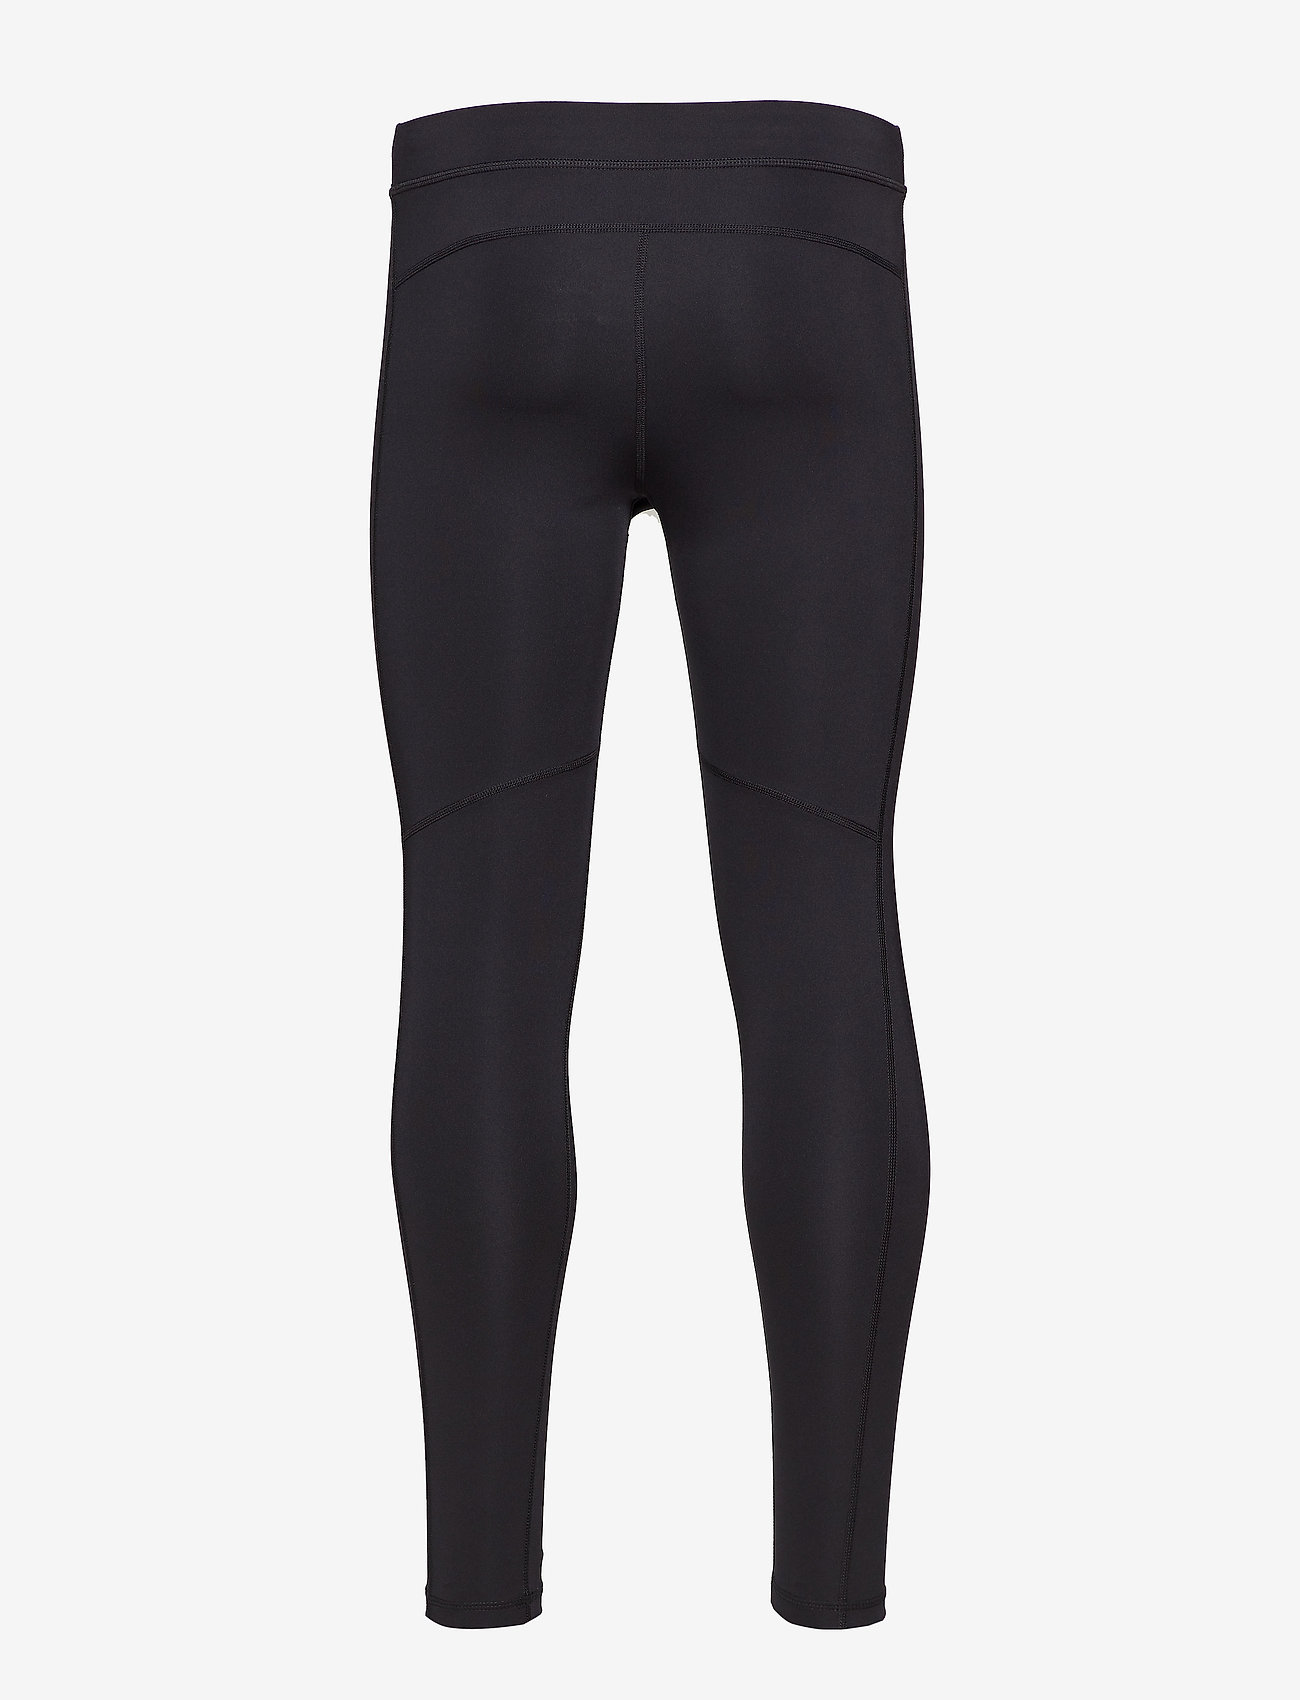 Calvin Klein Performance - FULL LENGTH TIGHT LO - sportleggings - ck black - 1